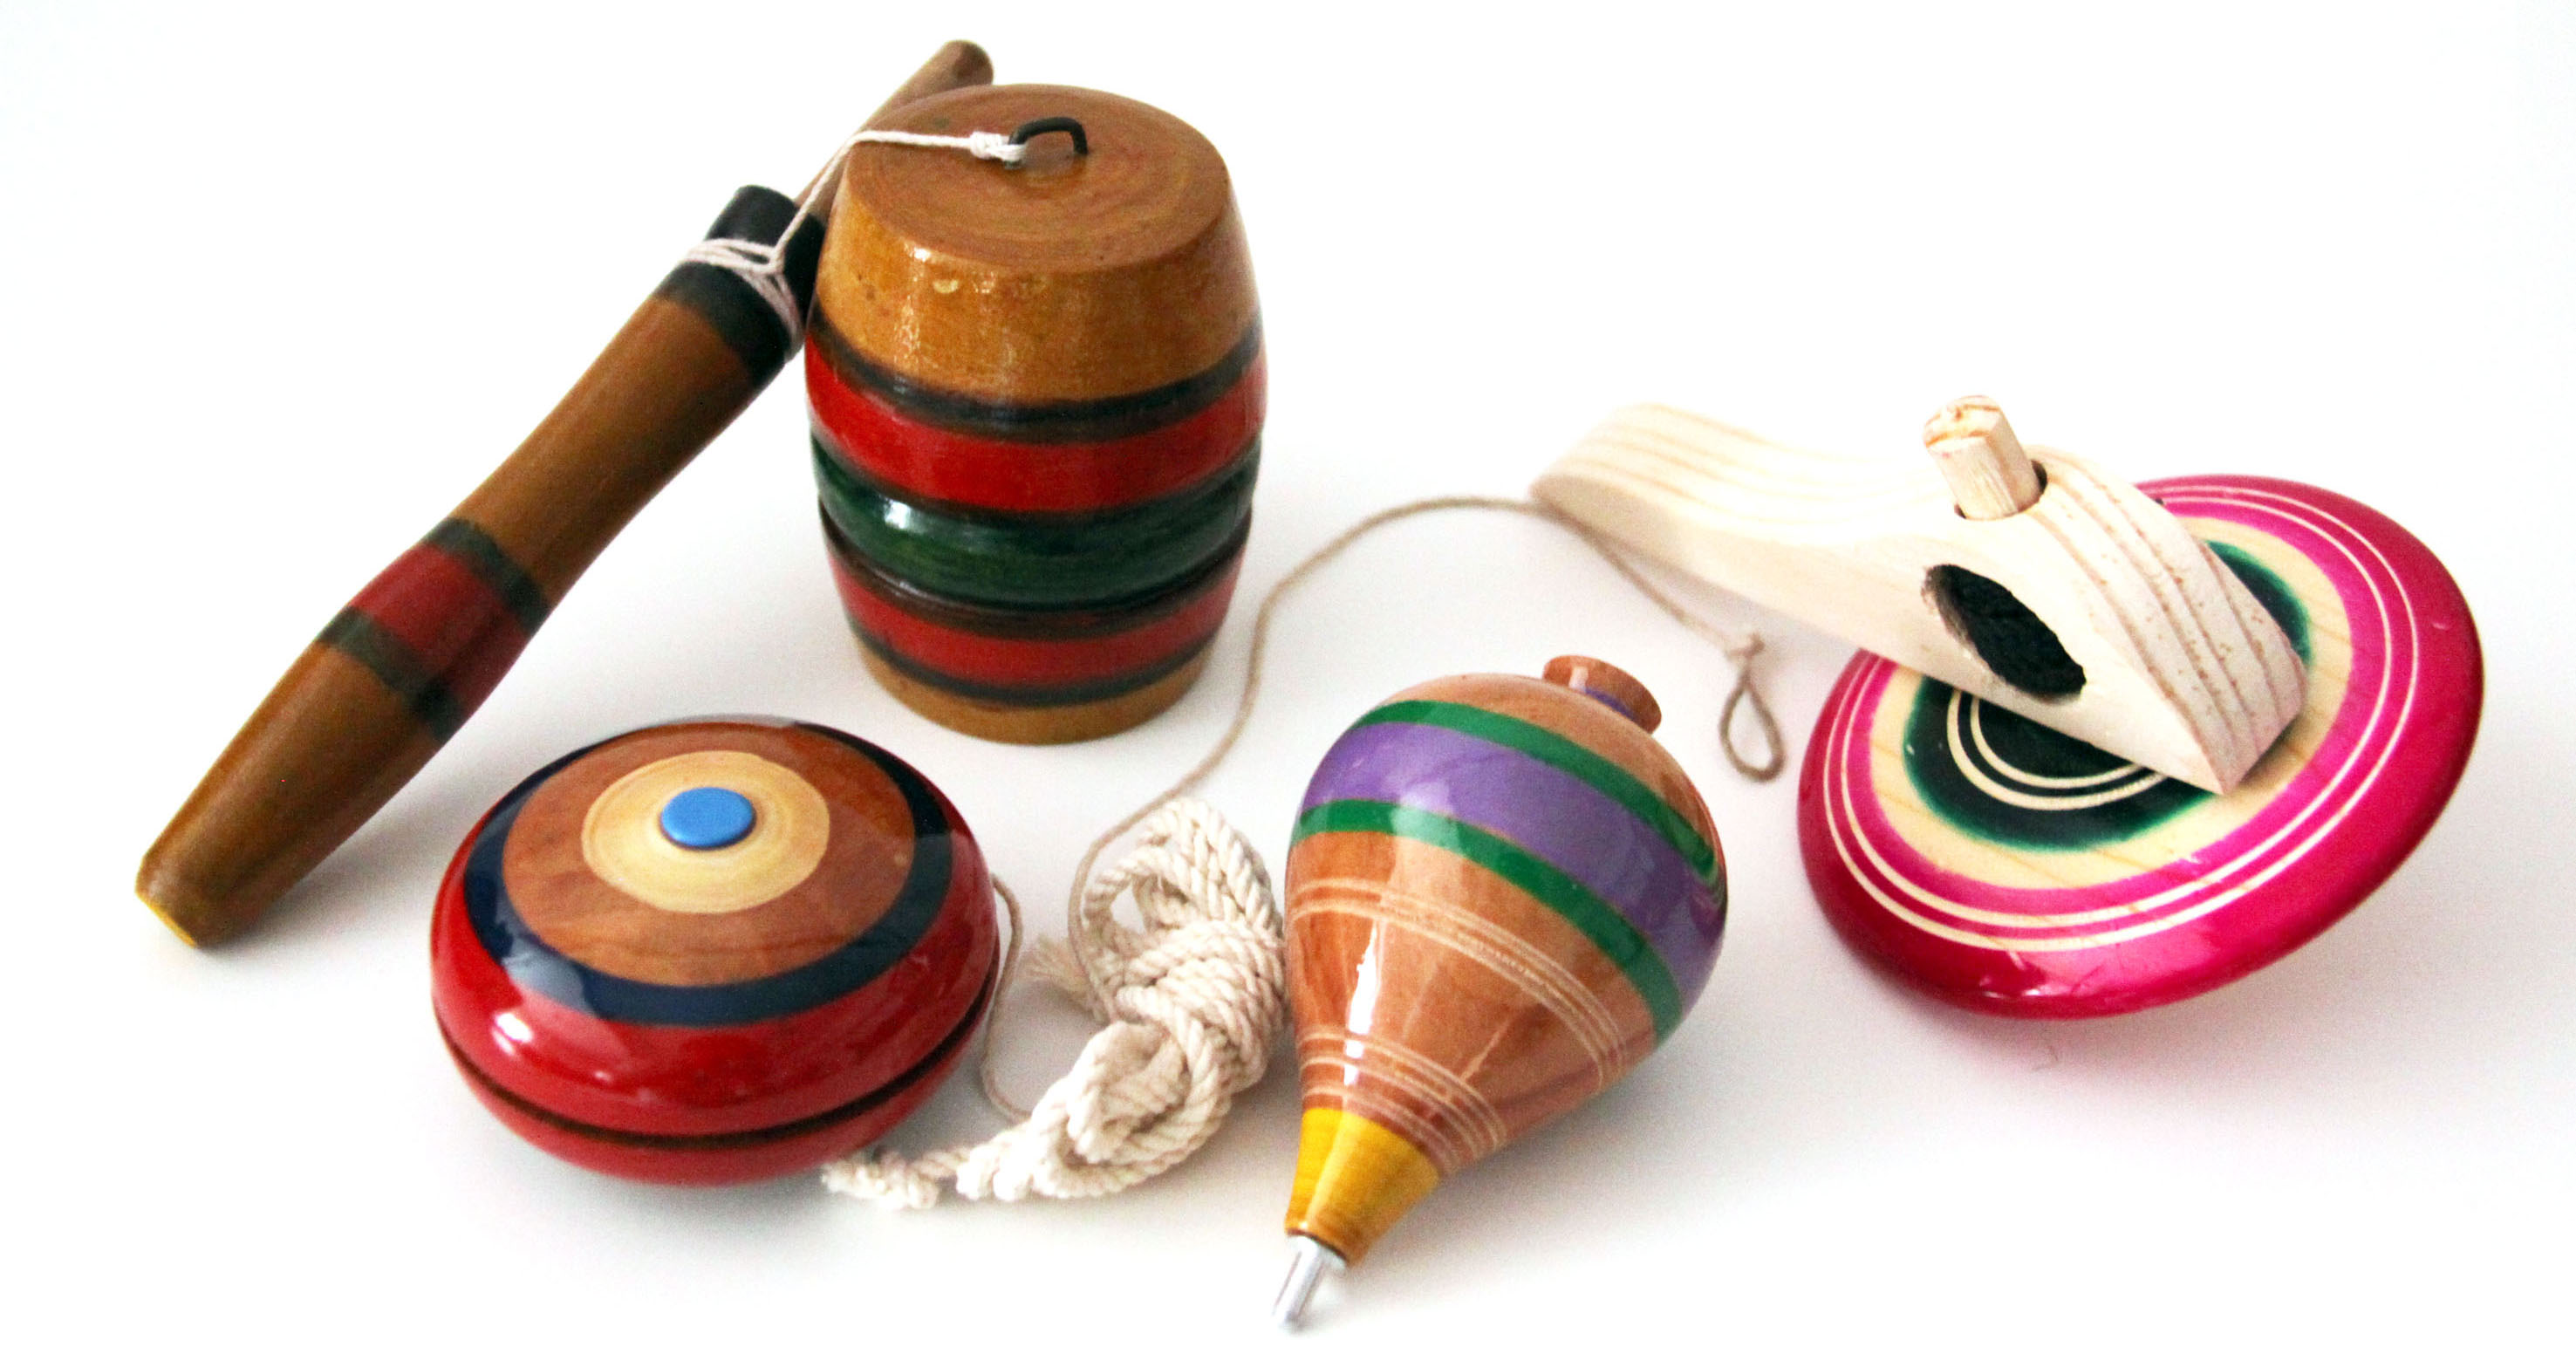 juguetes de madera elaborados artesanalmente